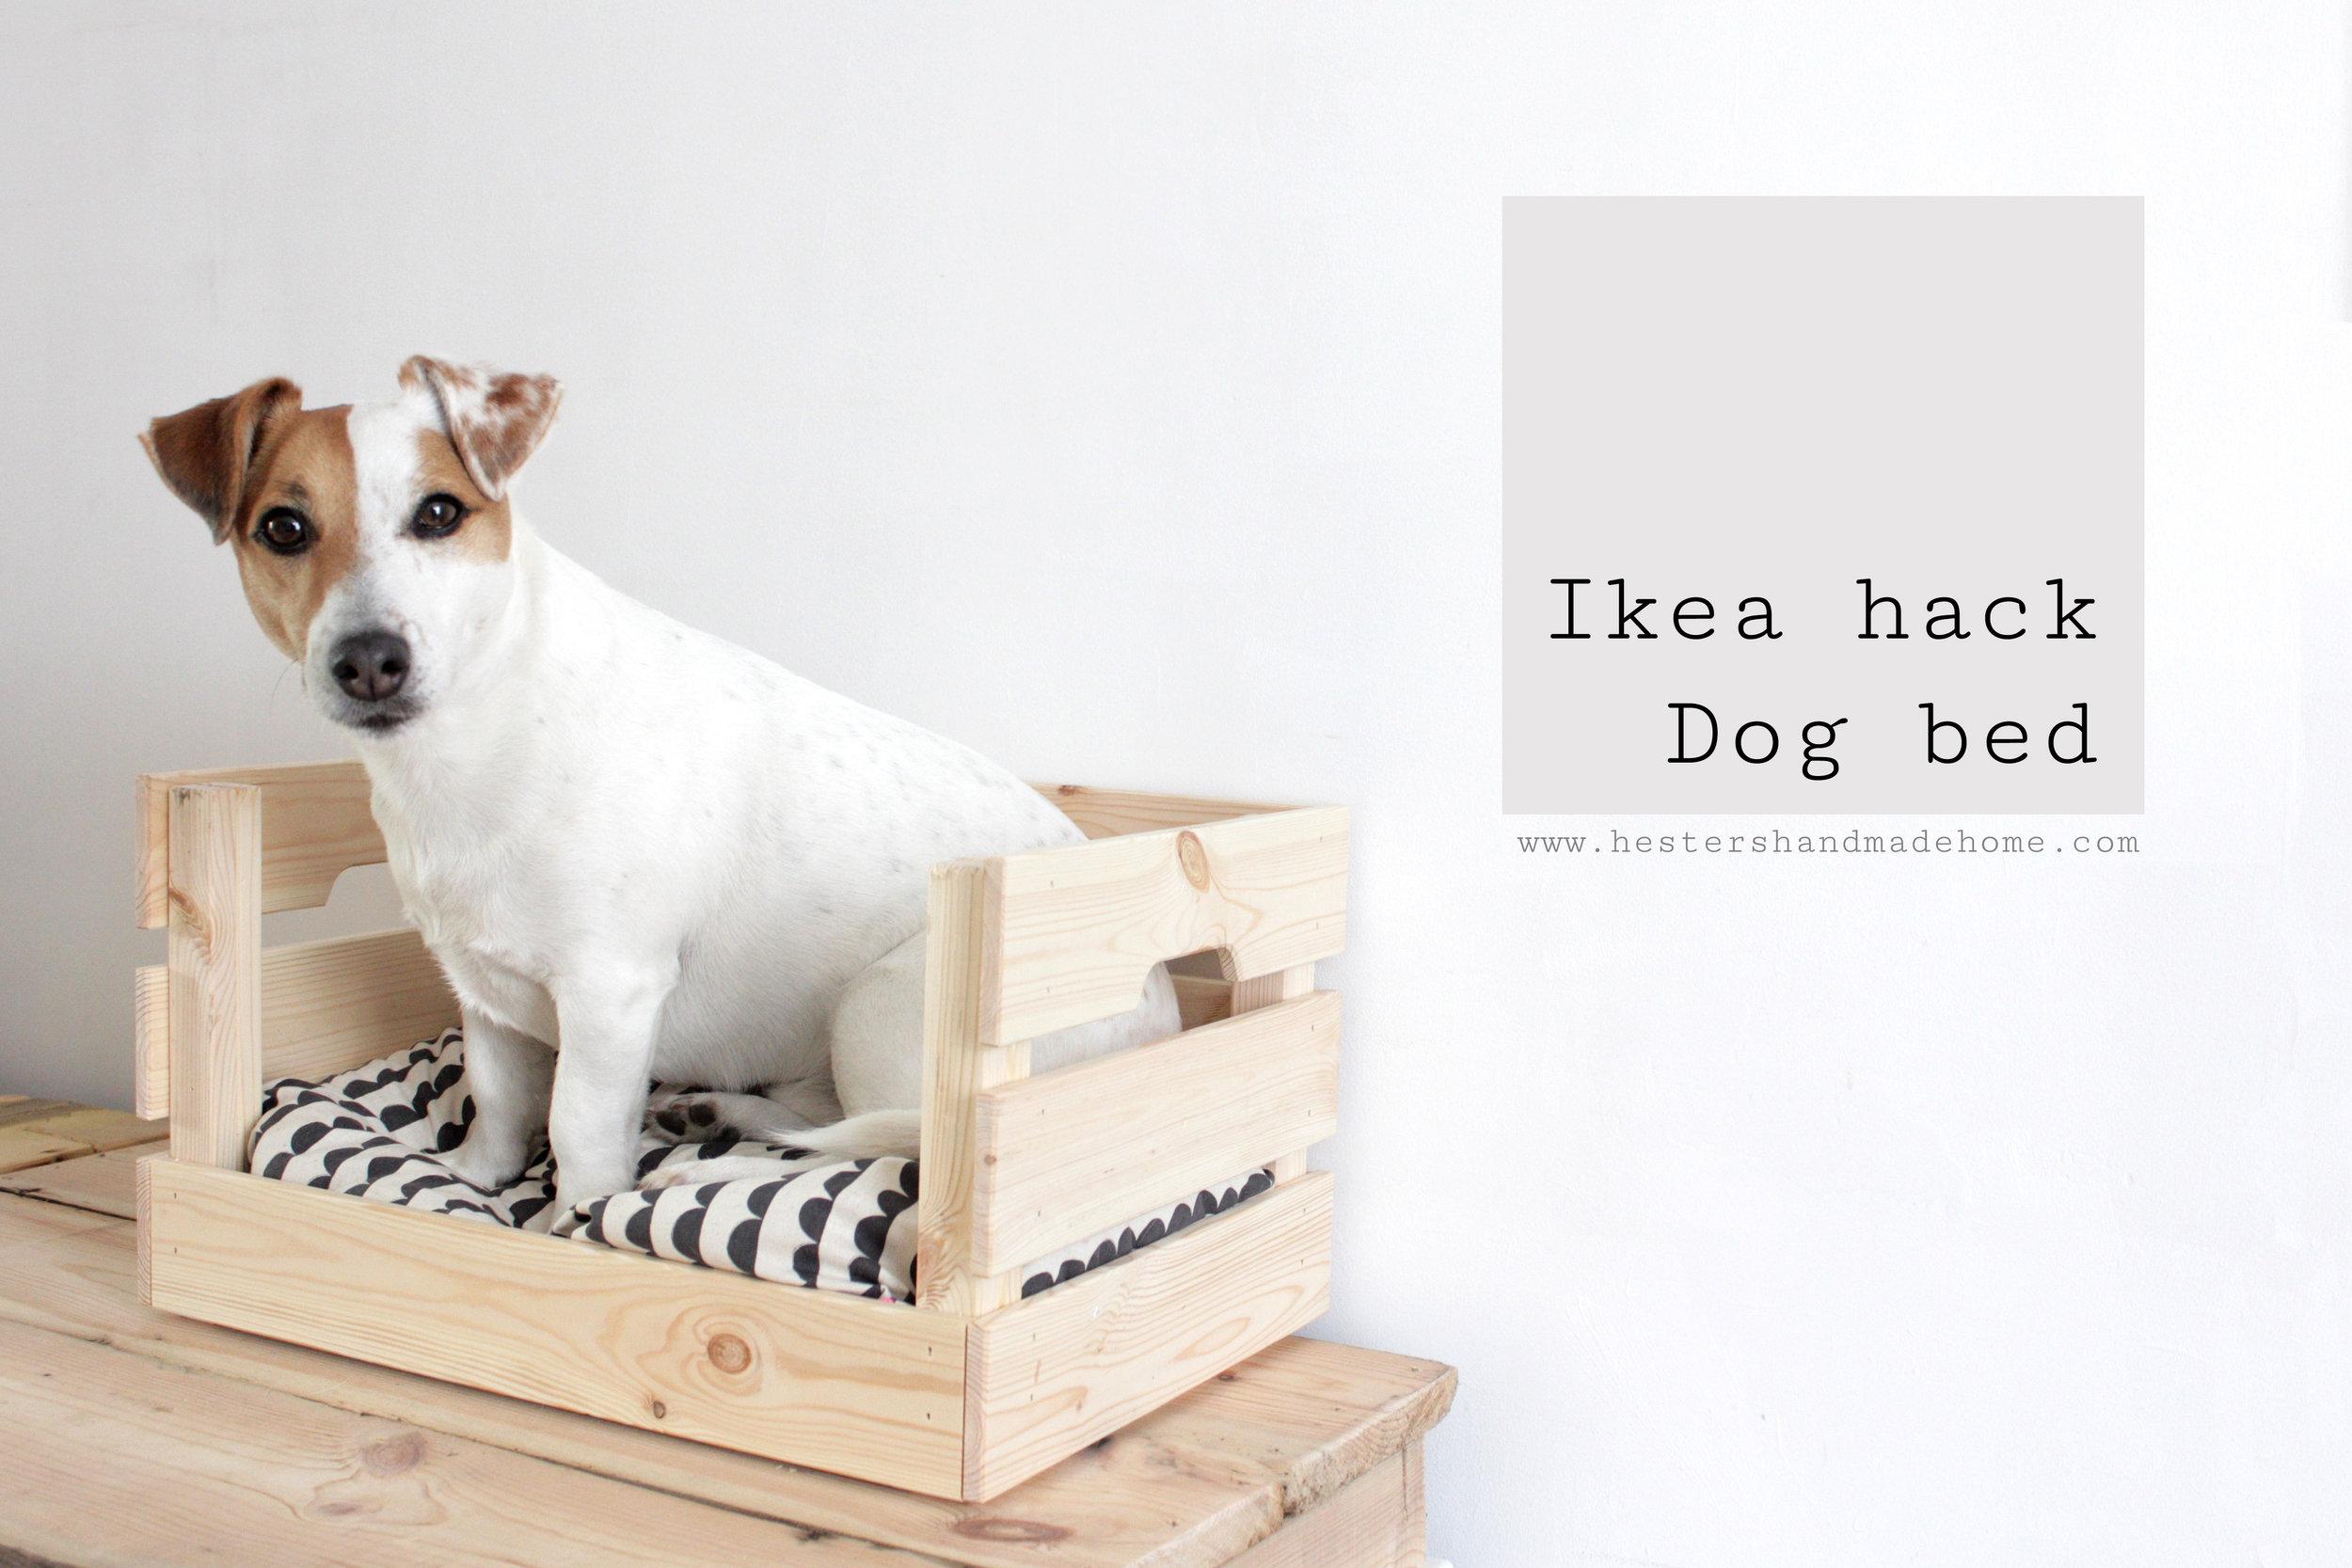 Ikea dogbed hesters handmade home.jpg